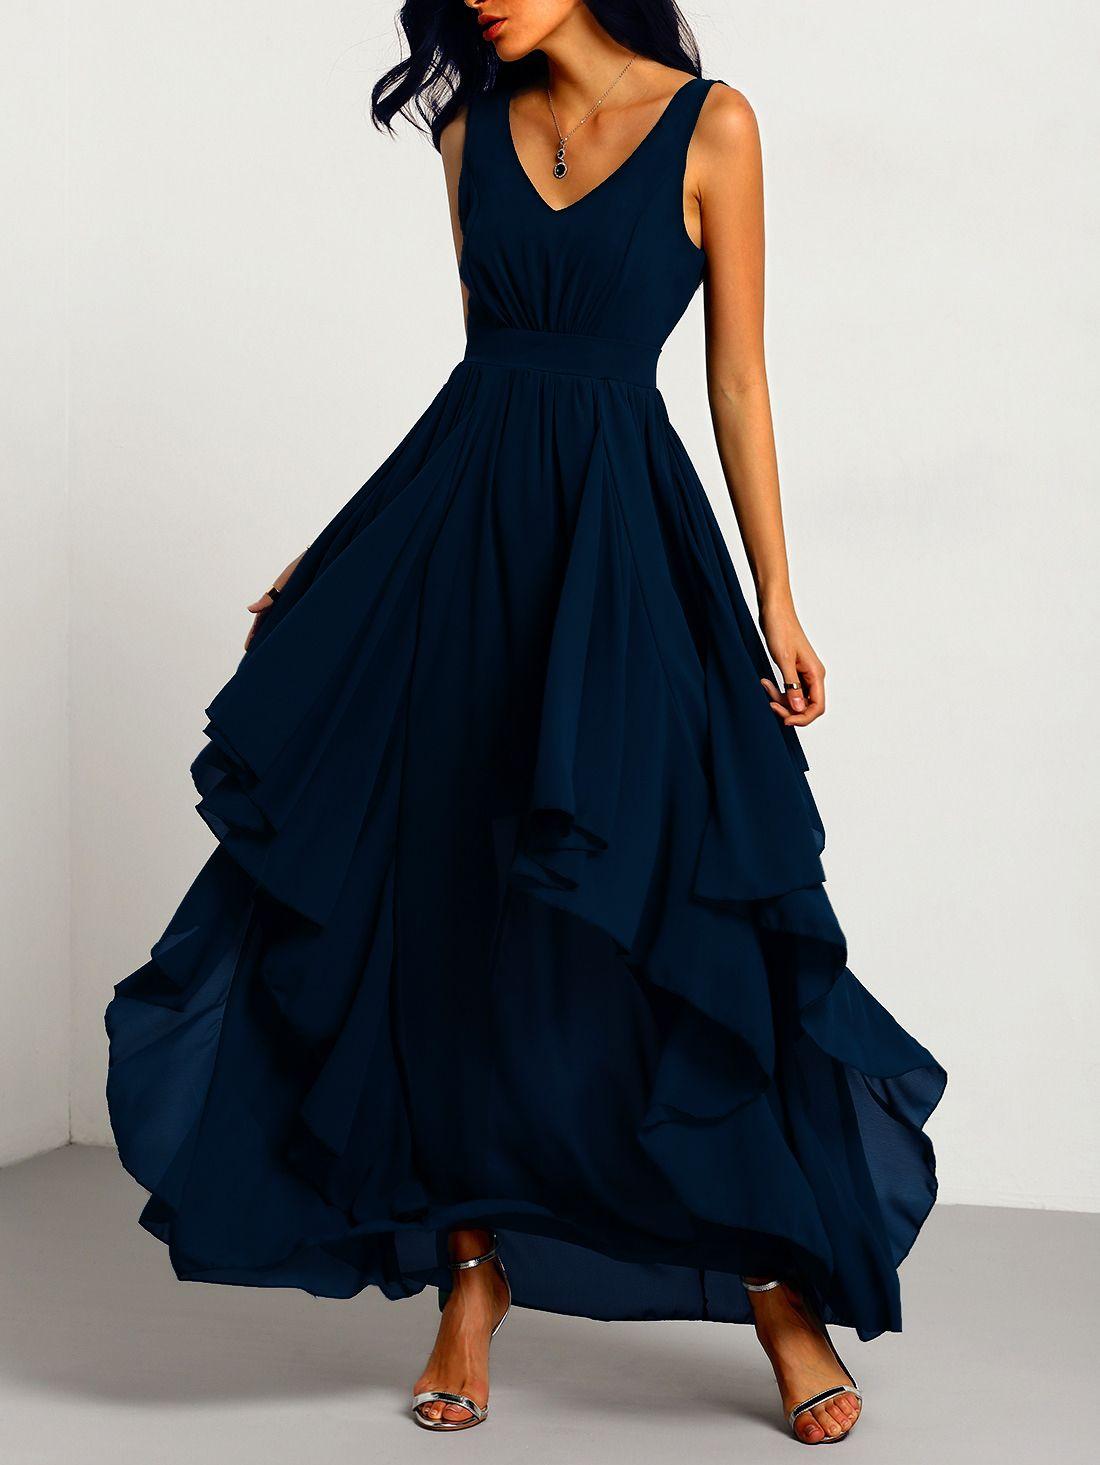 042fa7b0d4 Shop Navy Deep V Neck Layered Chiffon Dress online. SheIn offers Navy Deep  V Neck Layered Chiffon Dress & more to fit your fashionable needs.